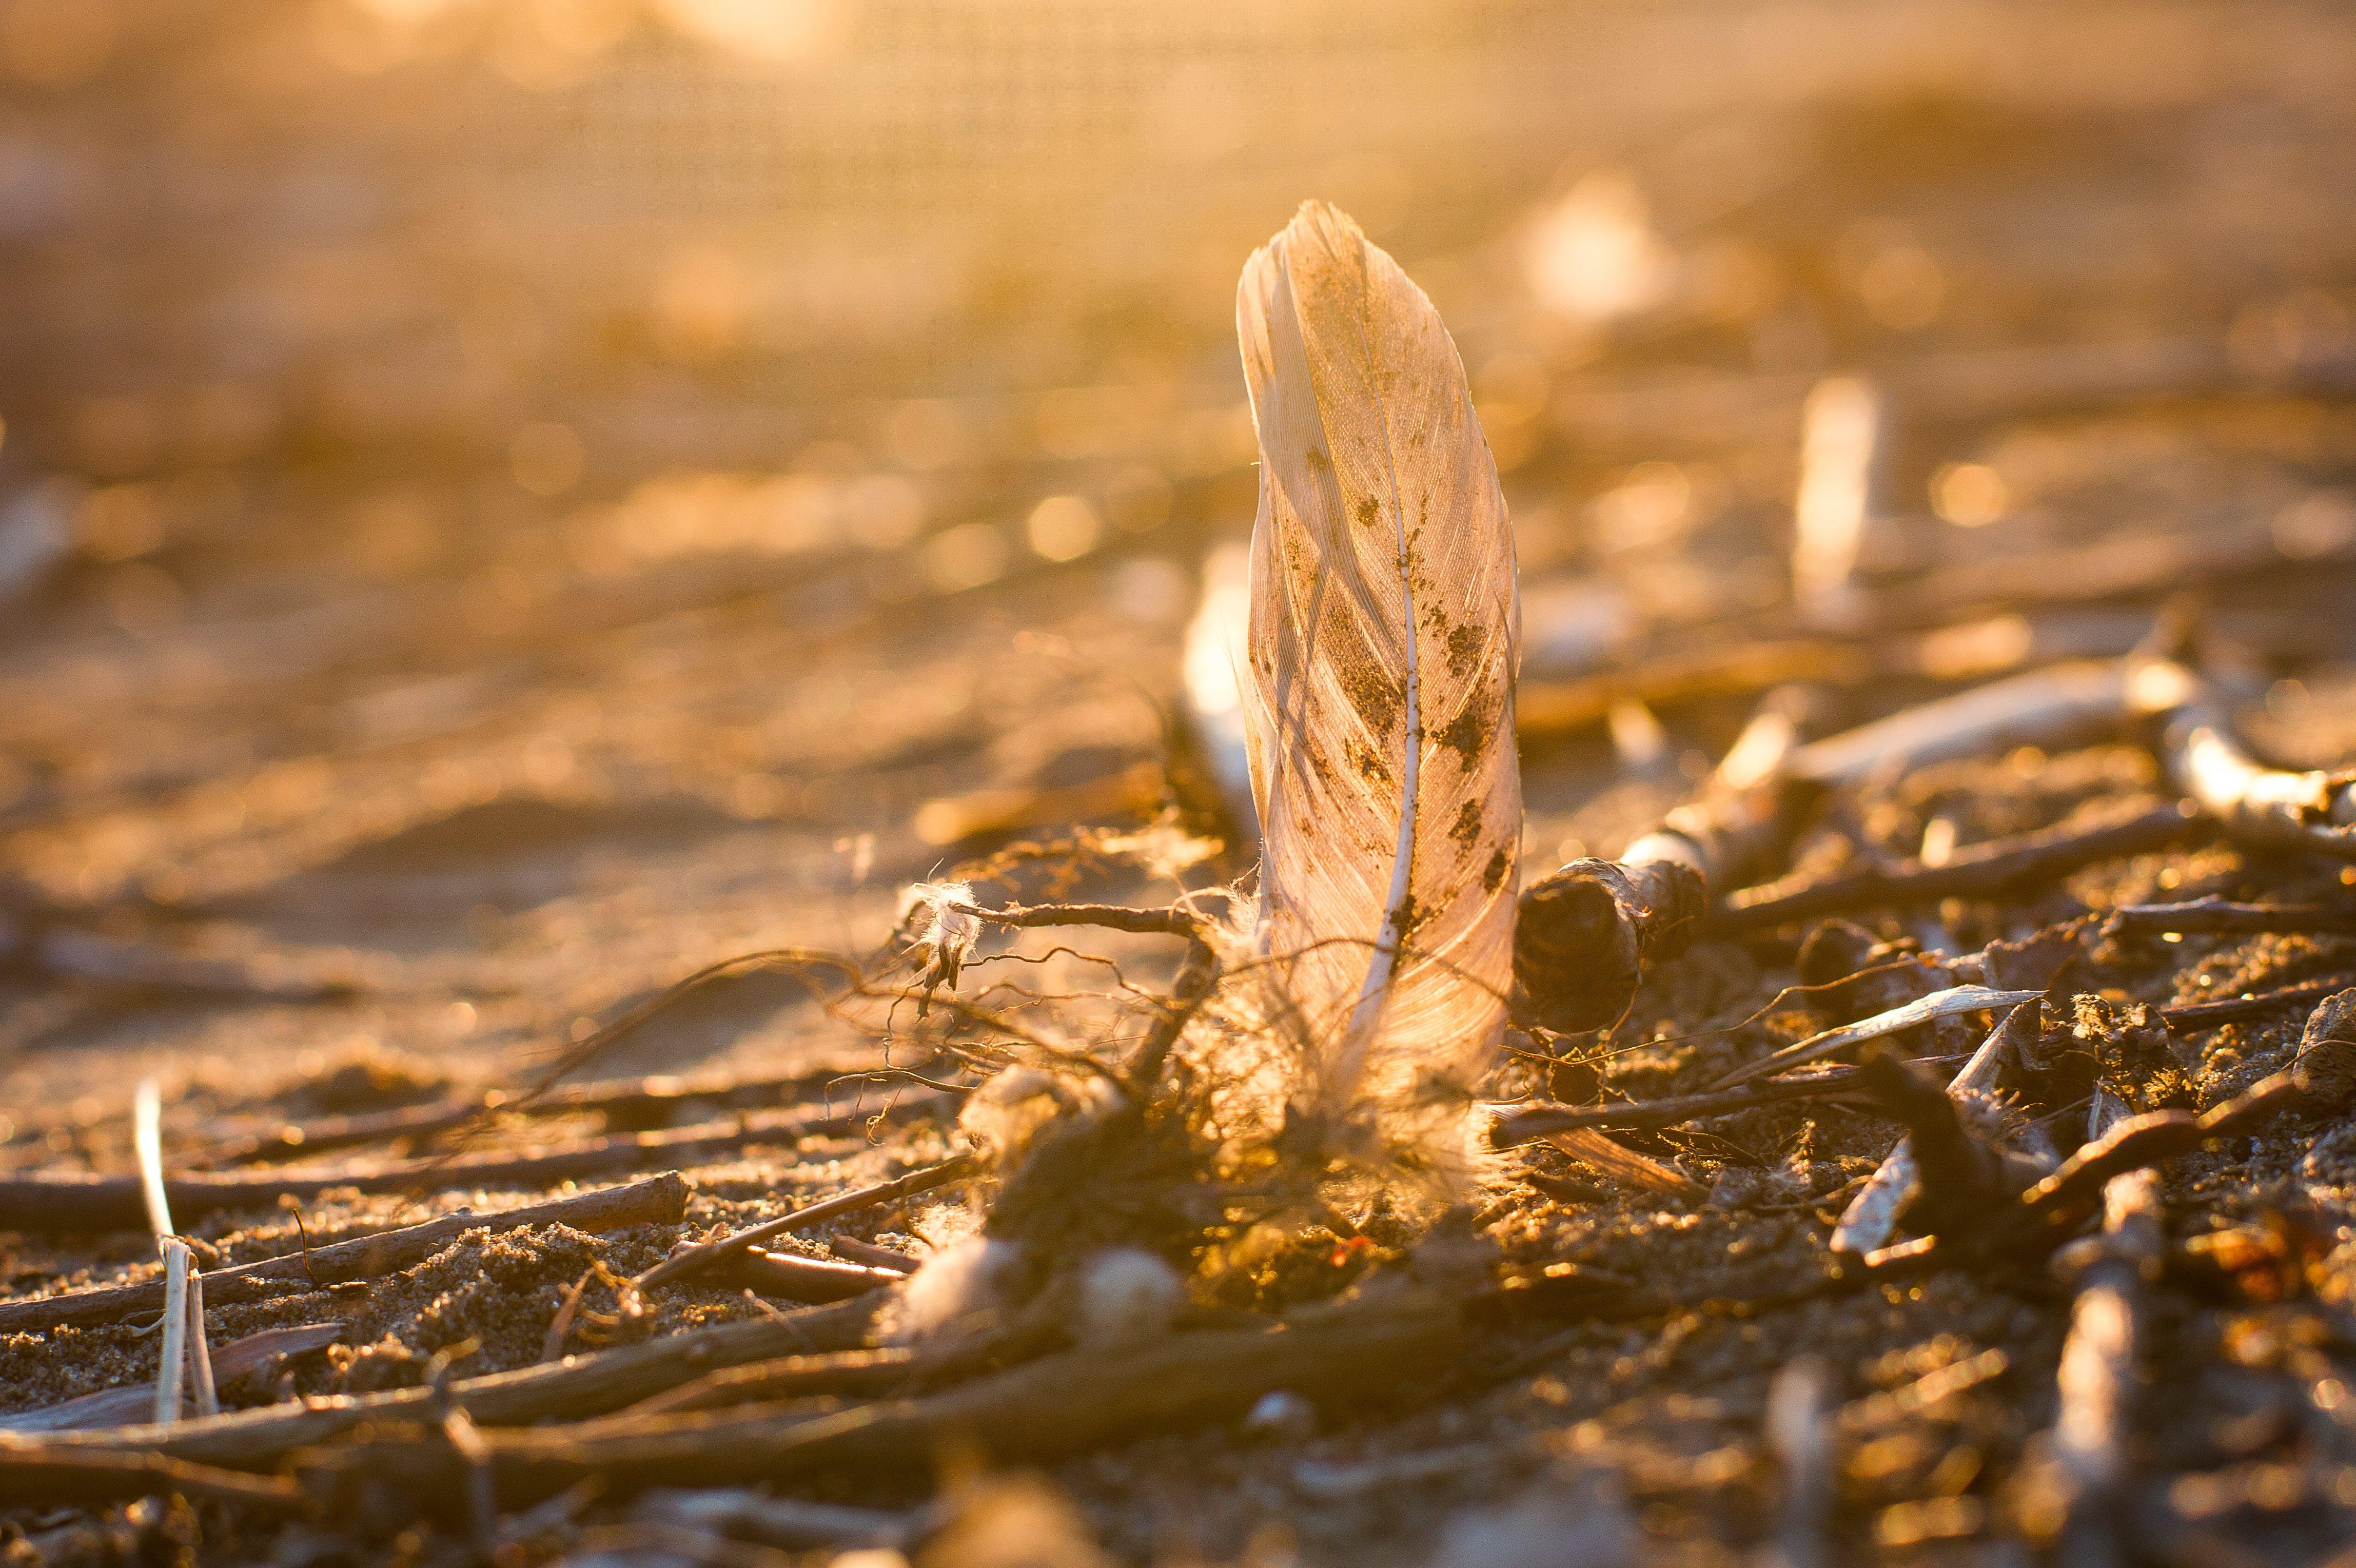 Free stock photo of Beautiful Sunsets, environment, feather, Warm & Wonderful